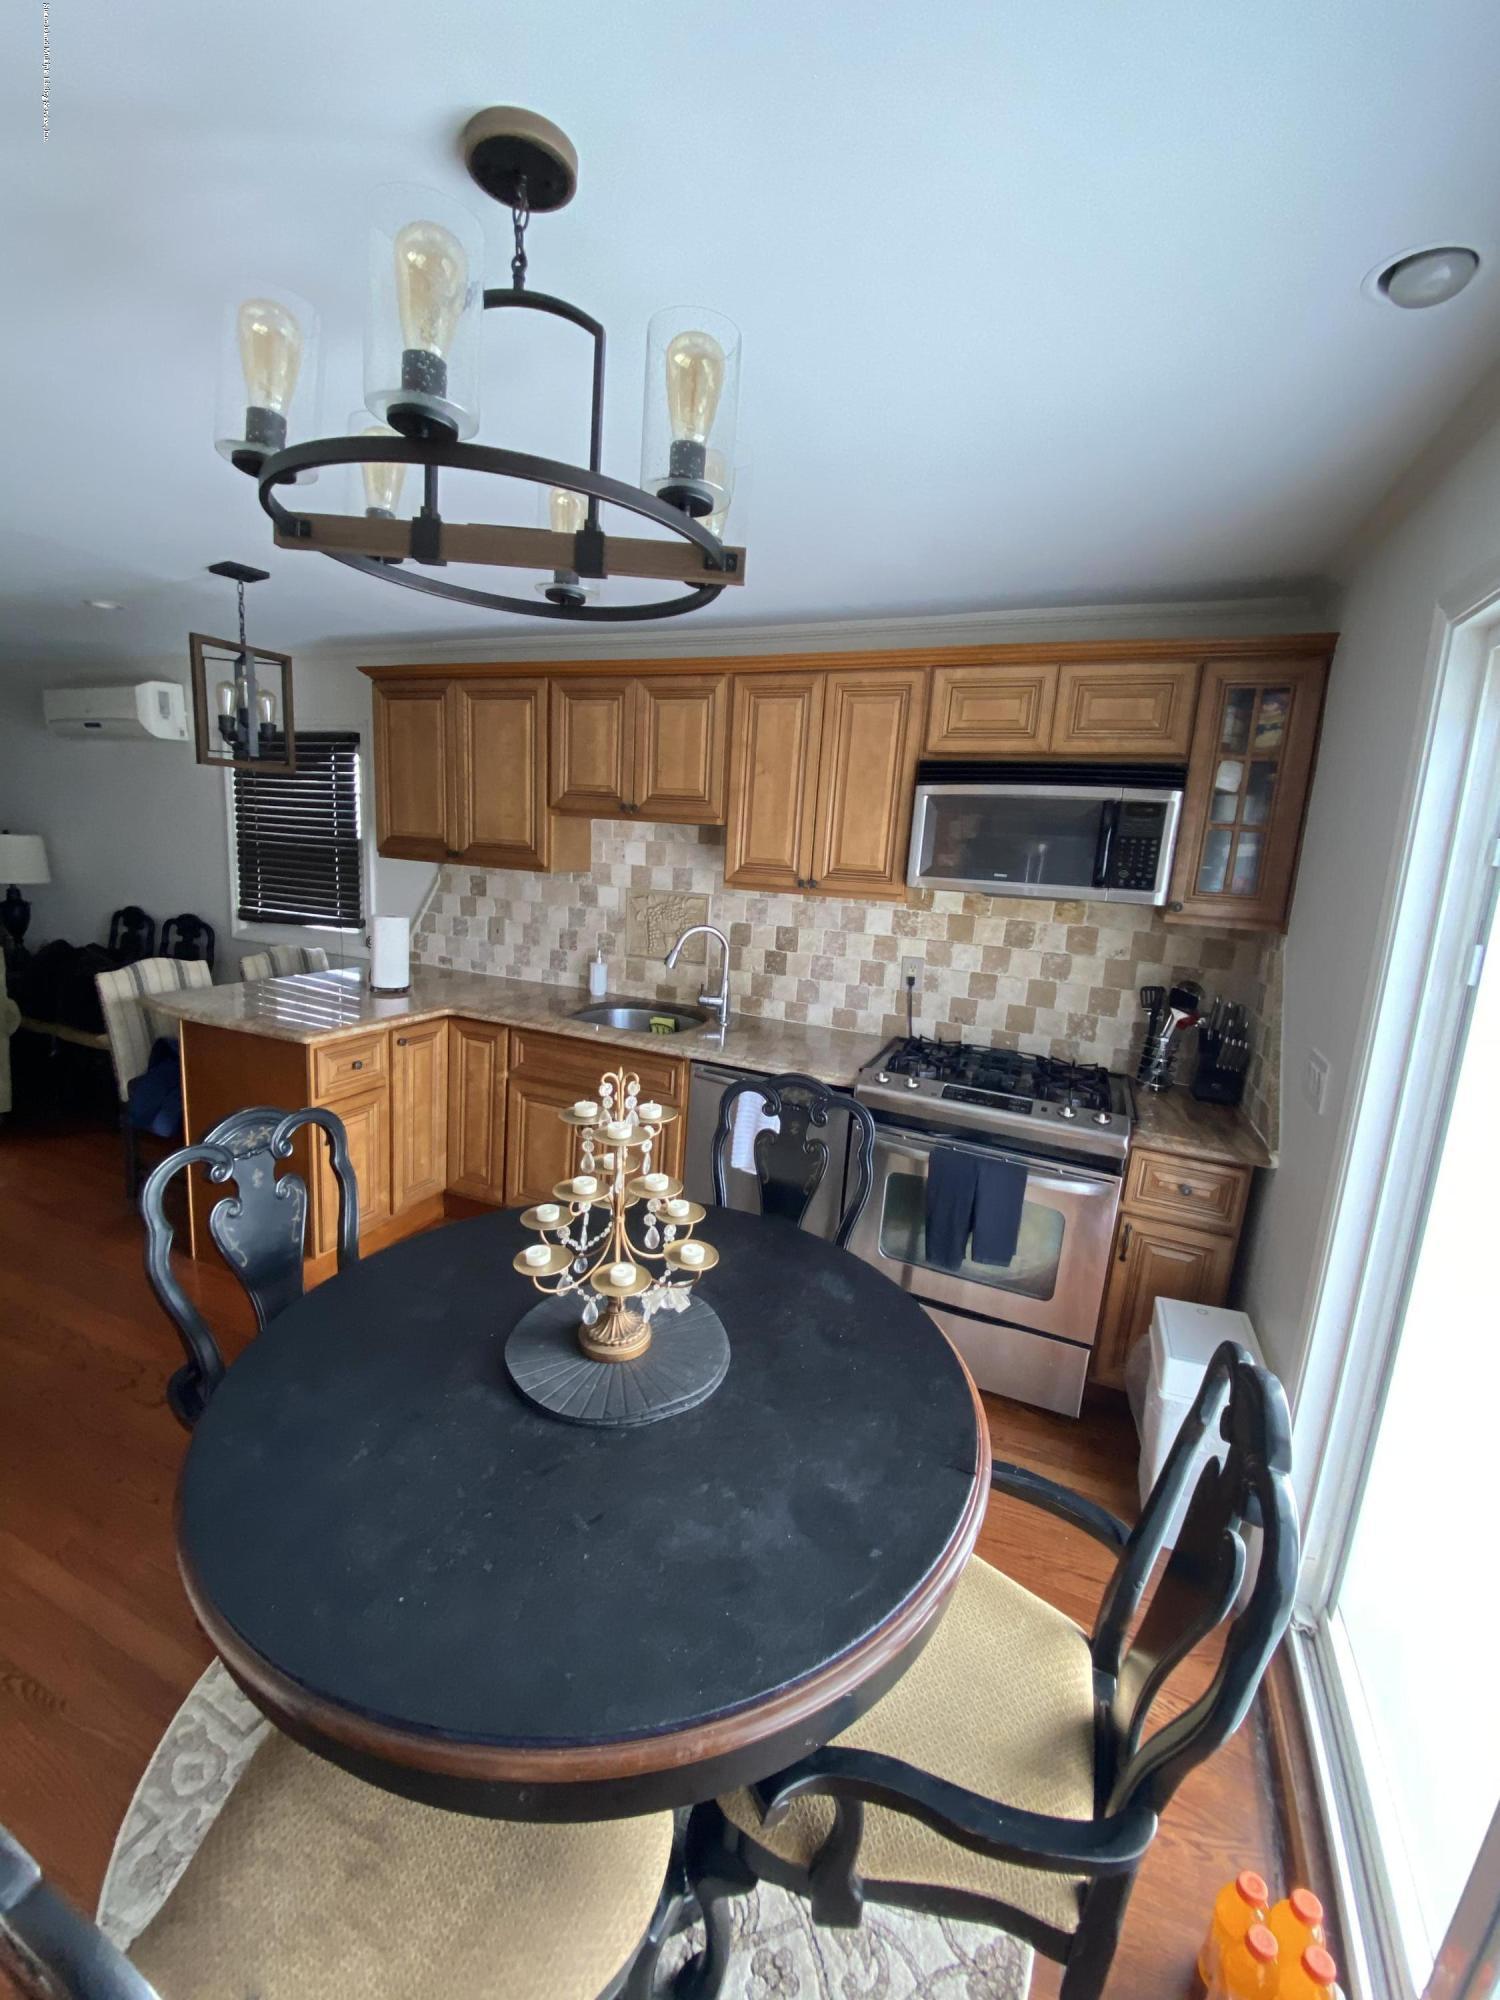 Single Family - Semi-Attached 370 Seaver Avenue  Staten Island, NY 10305, MLS-1136339-23